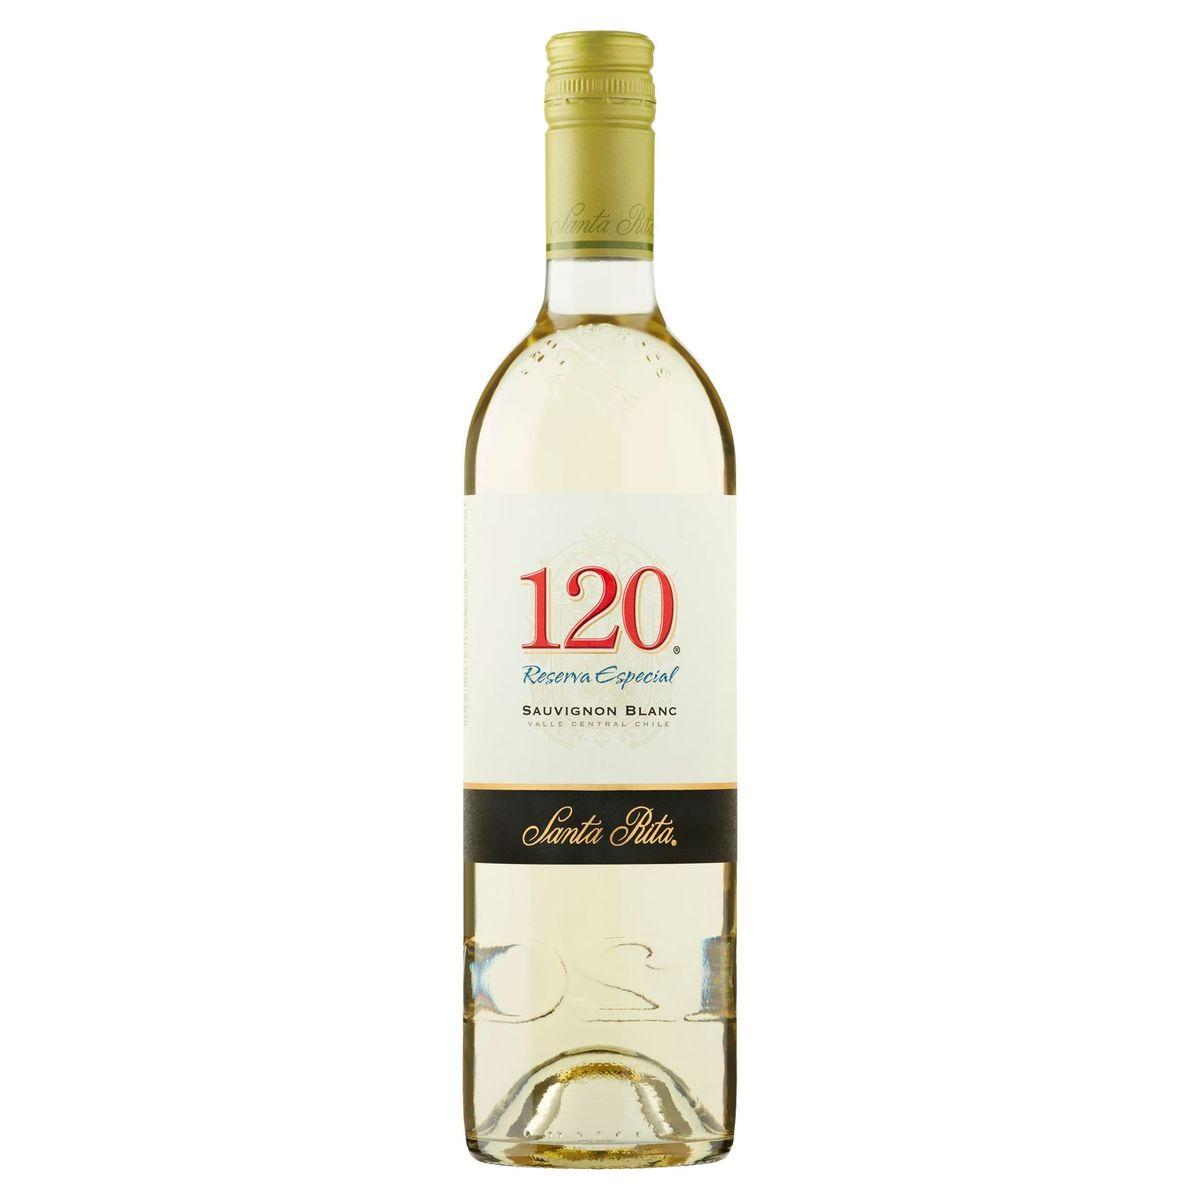 Santa Rita 120 Sauvignon Blanc 750 ml